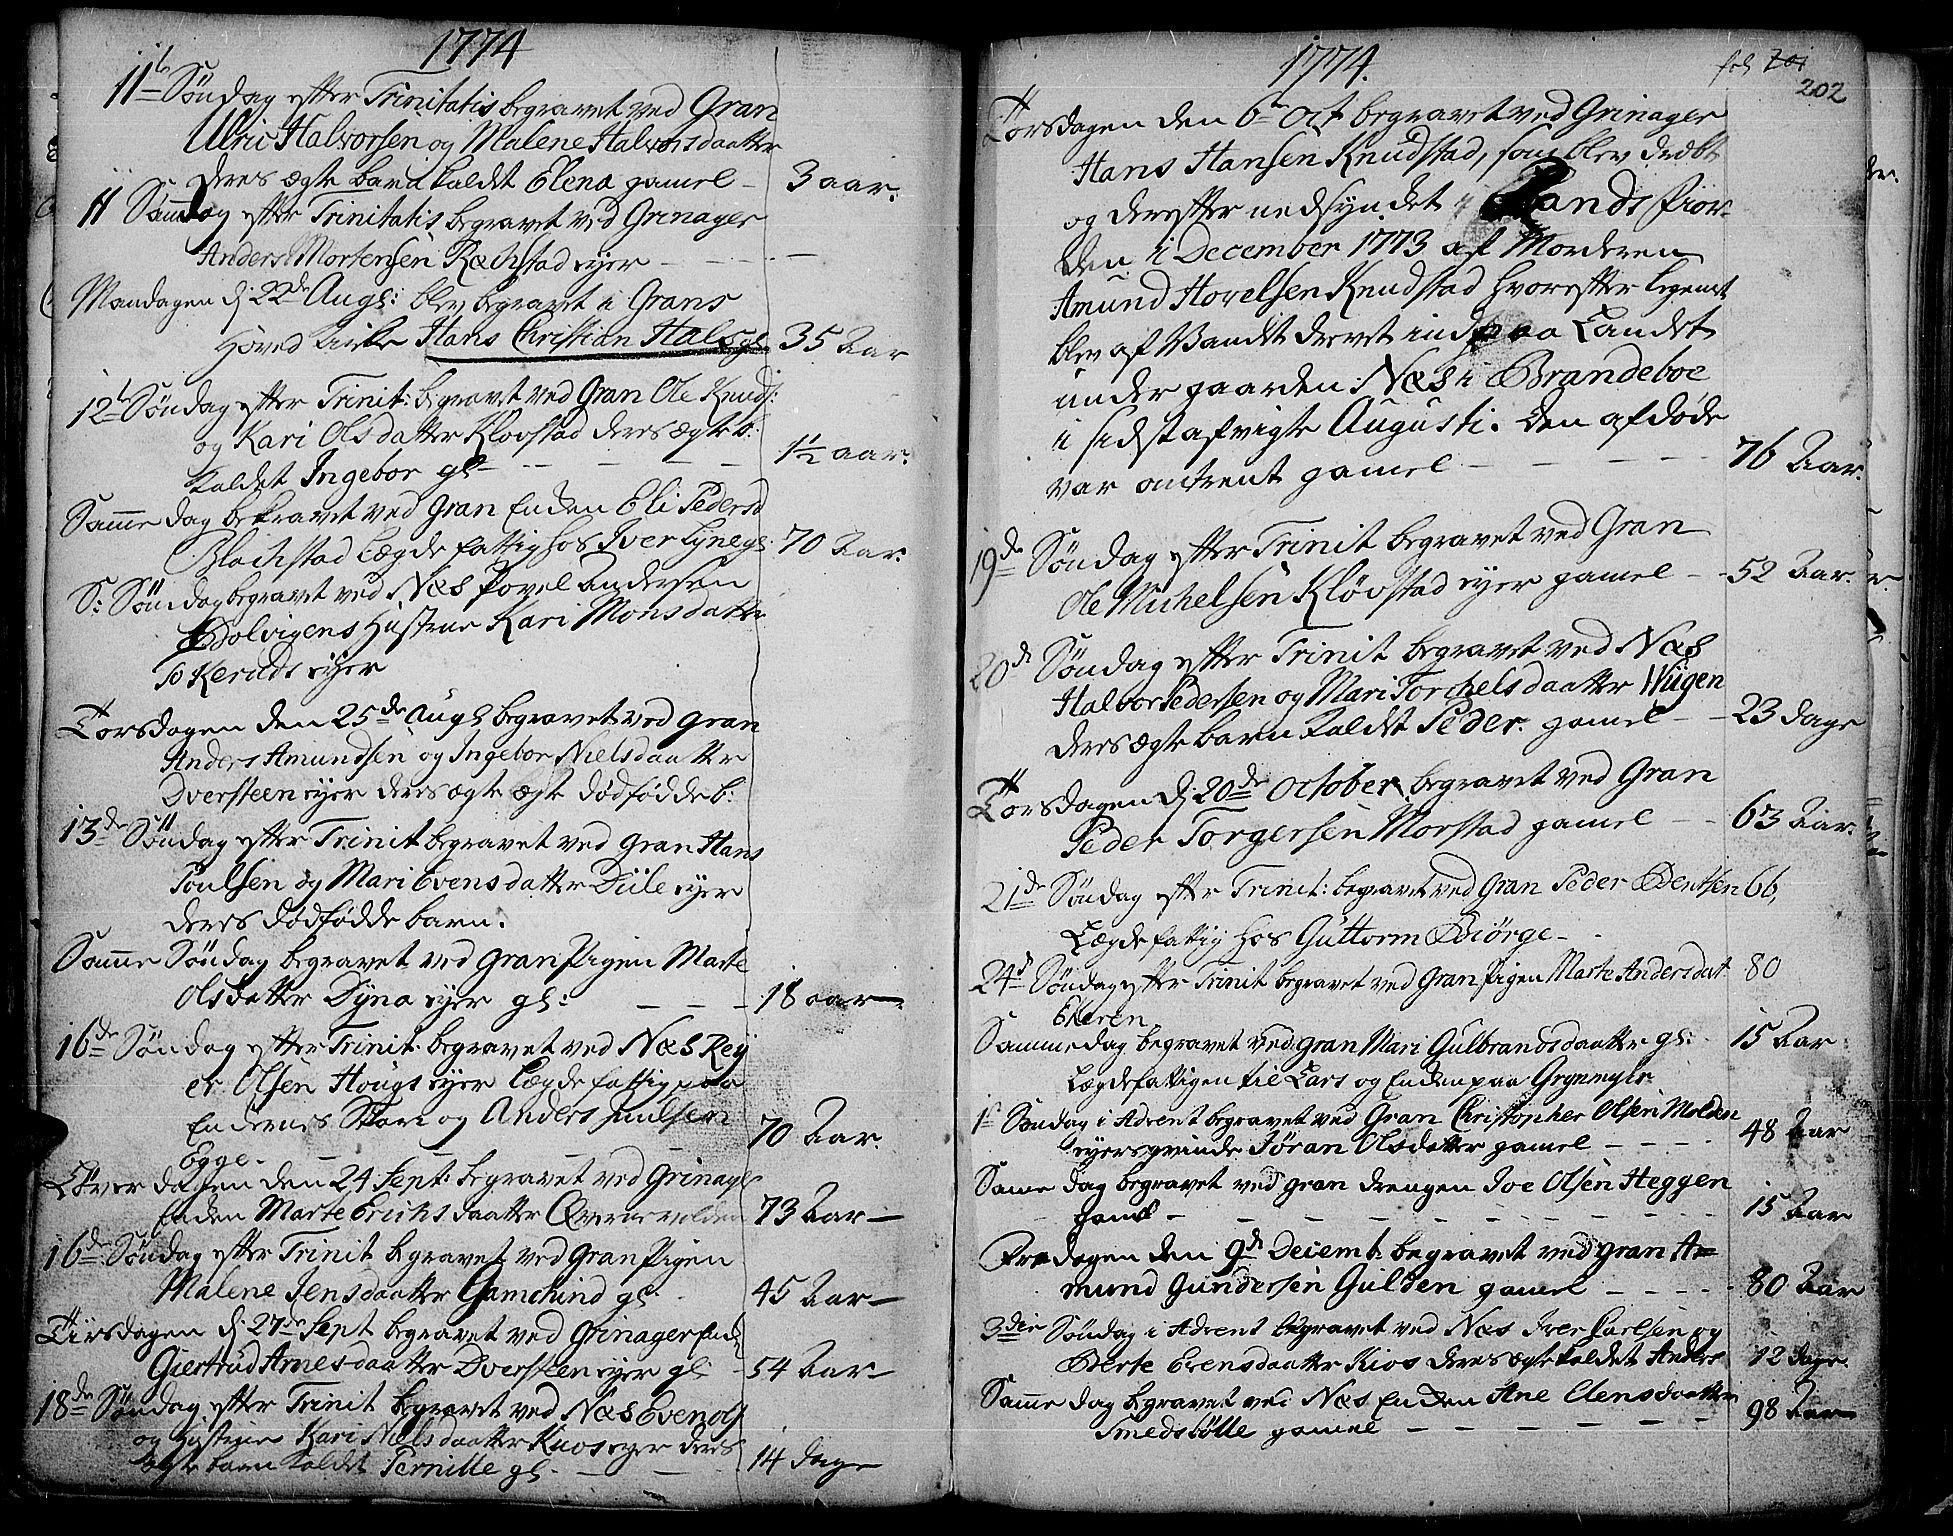 SAH, Gran prestekontor, Ministerialbok nr. 4, 1759-1775, s. 202